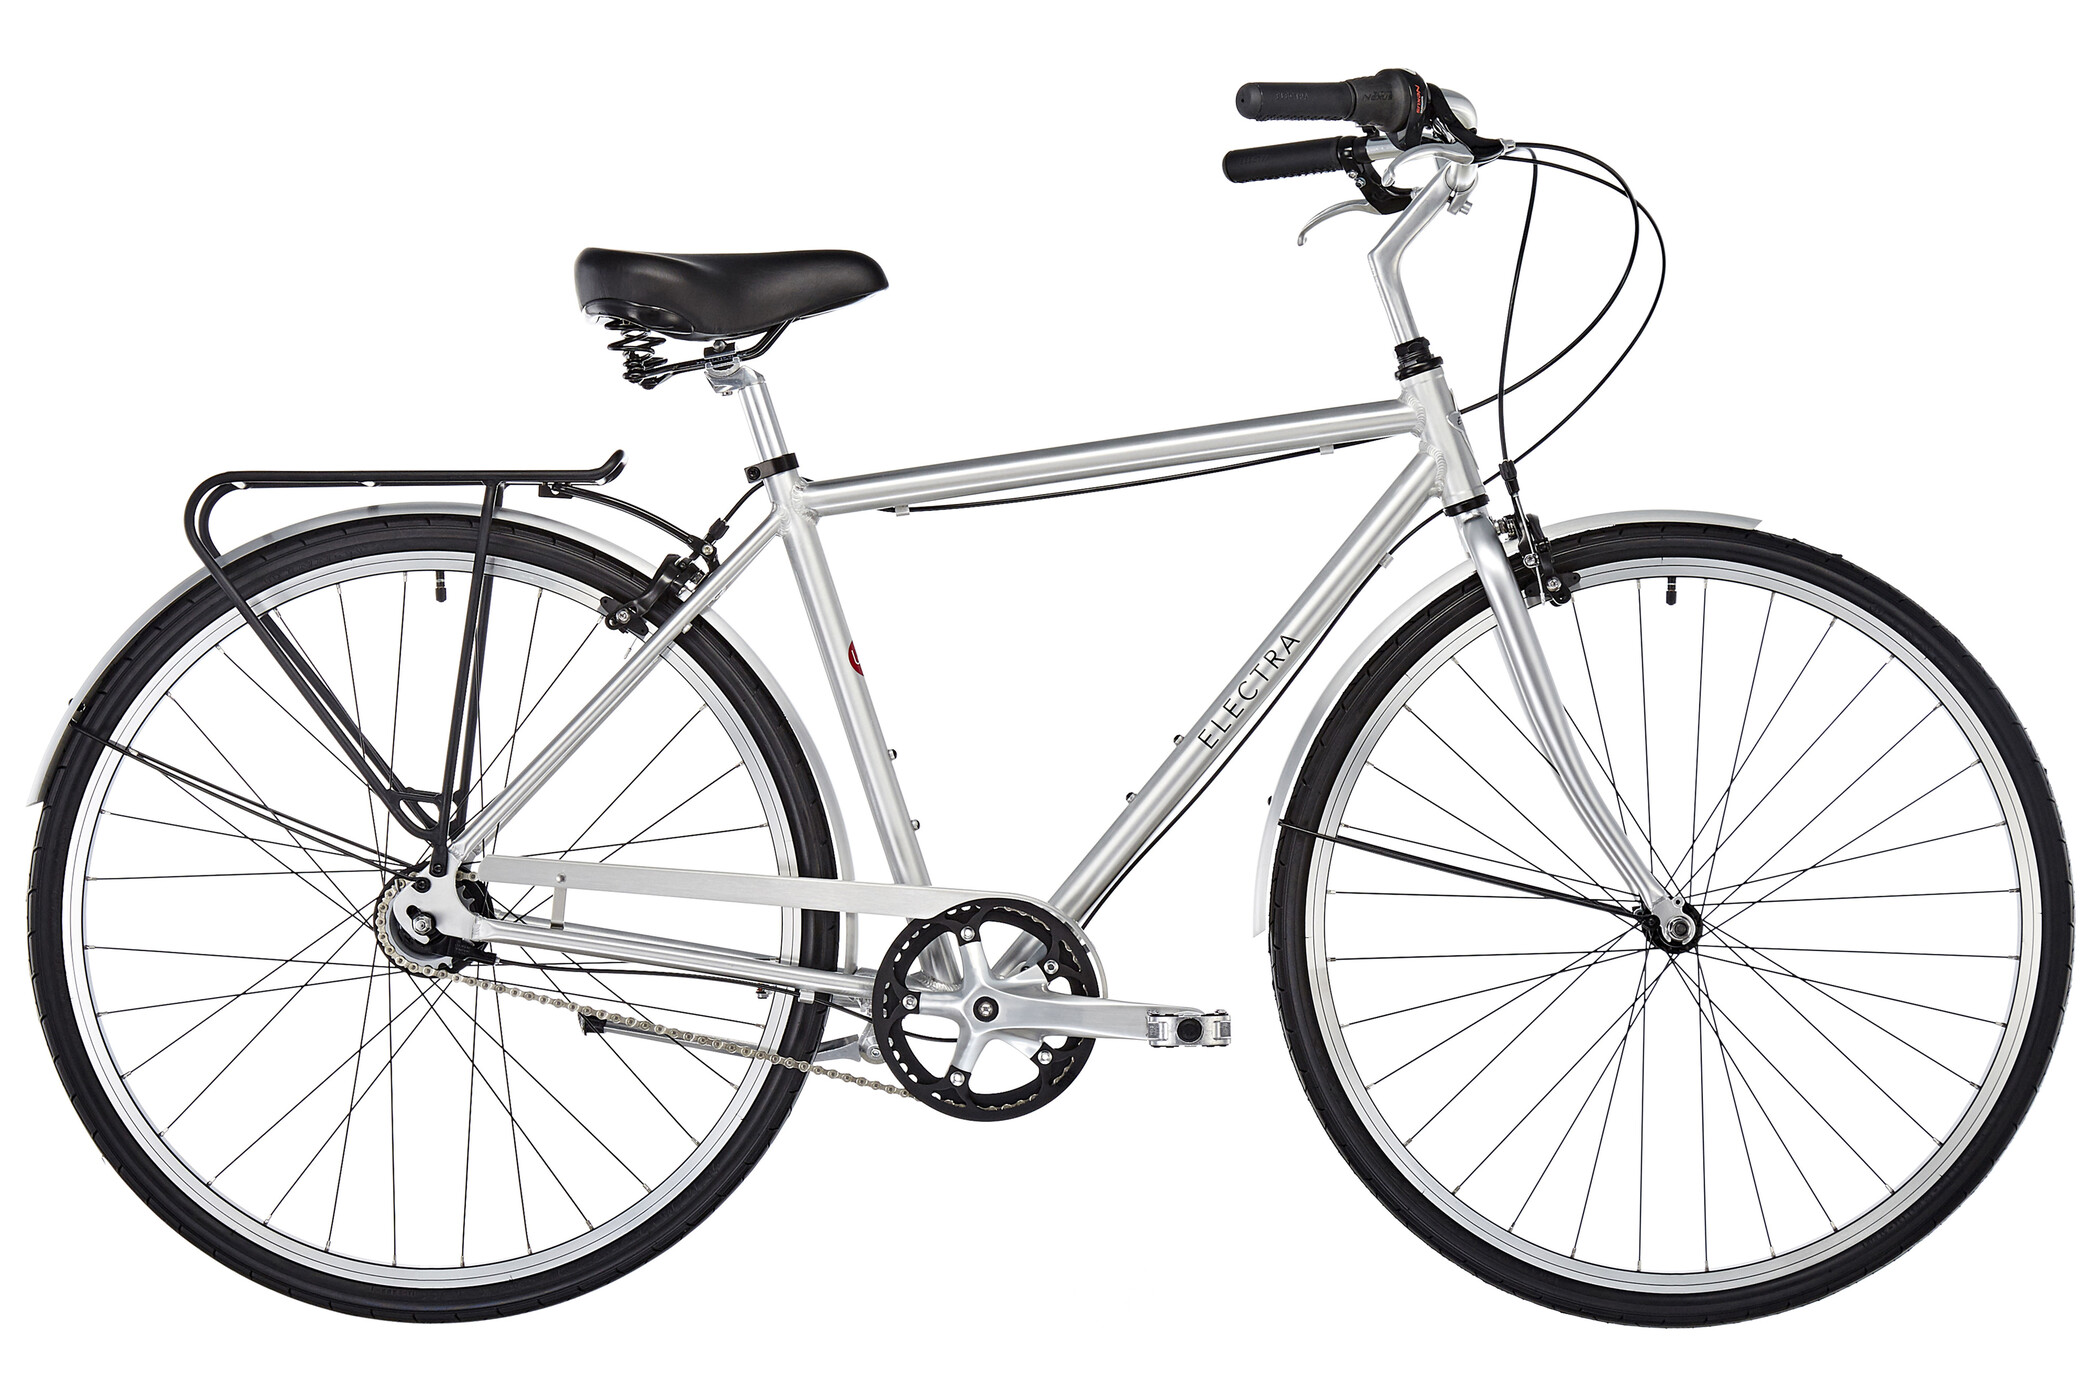 Electra Loft 7i Herrer, brushed aluminum | City-cykler